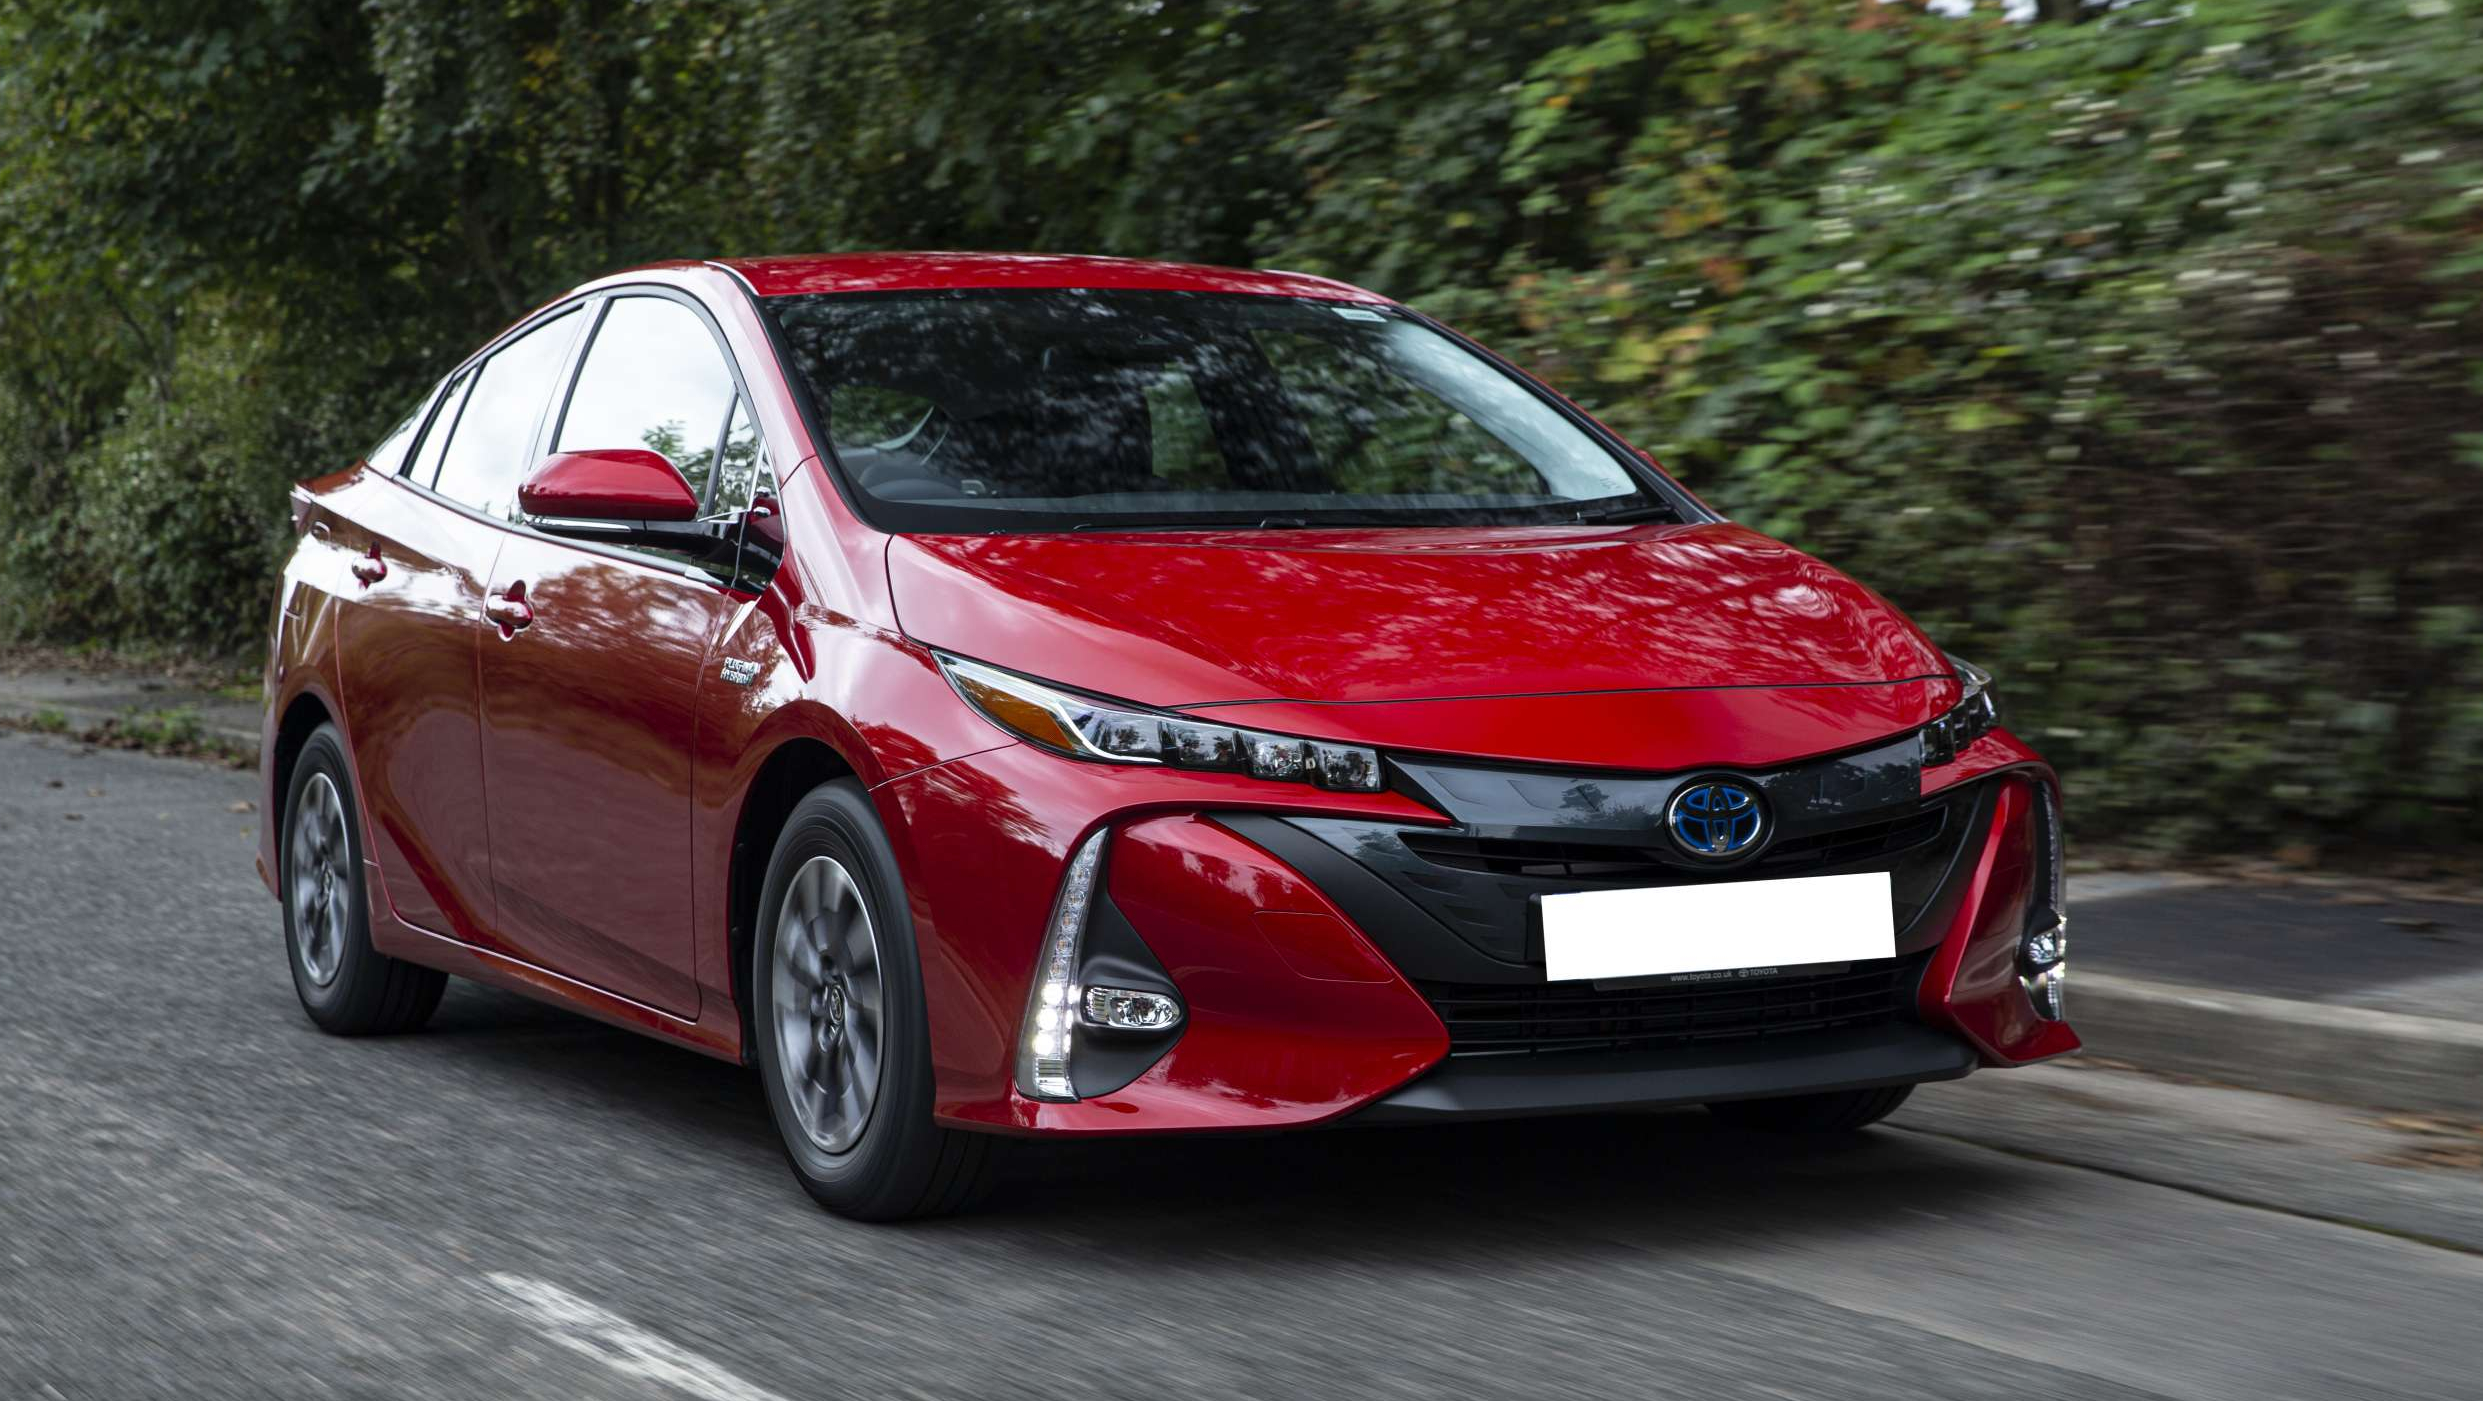 Toyota-Prius-Plugin-Business-Edition-Plus-Exterior-Dynamic-6 (1)